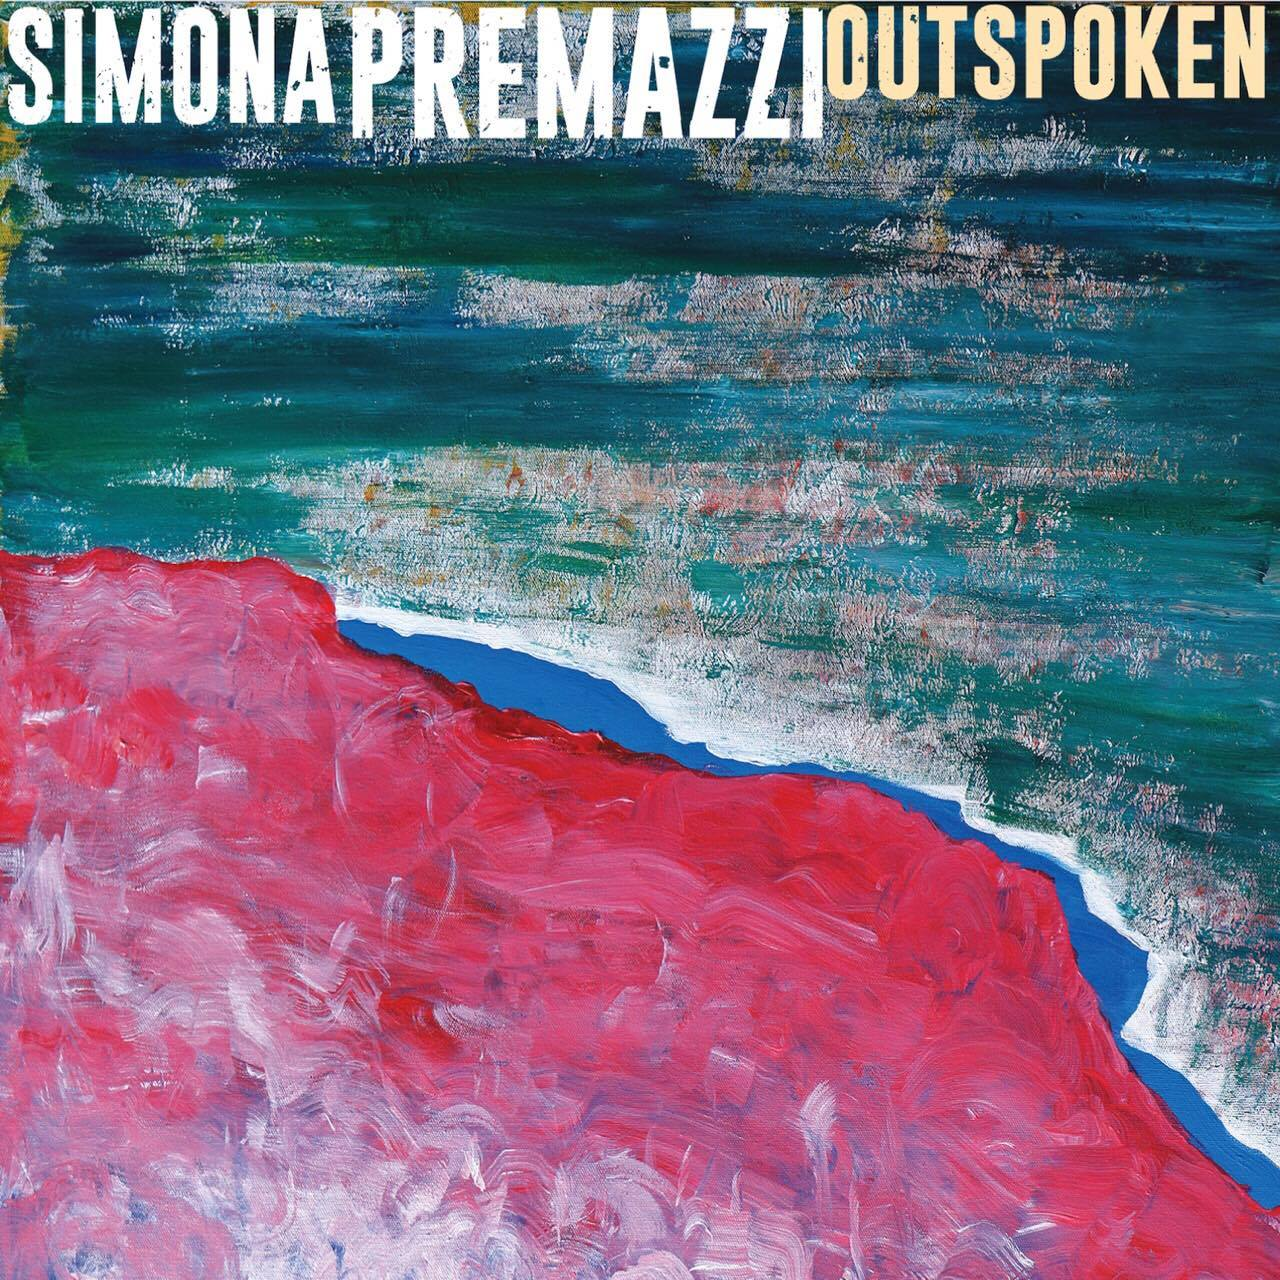 'Outspoken', Simona Premazzi